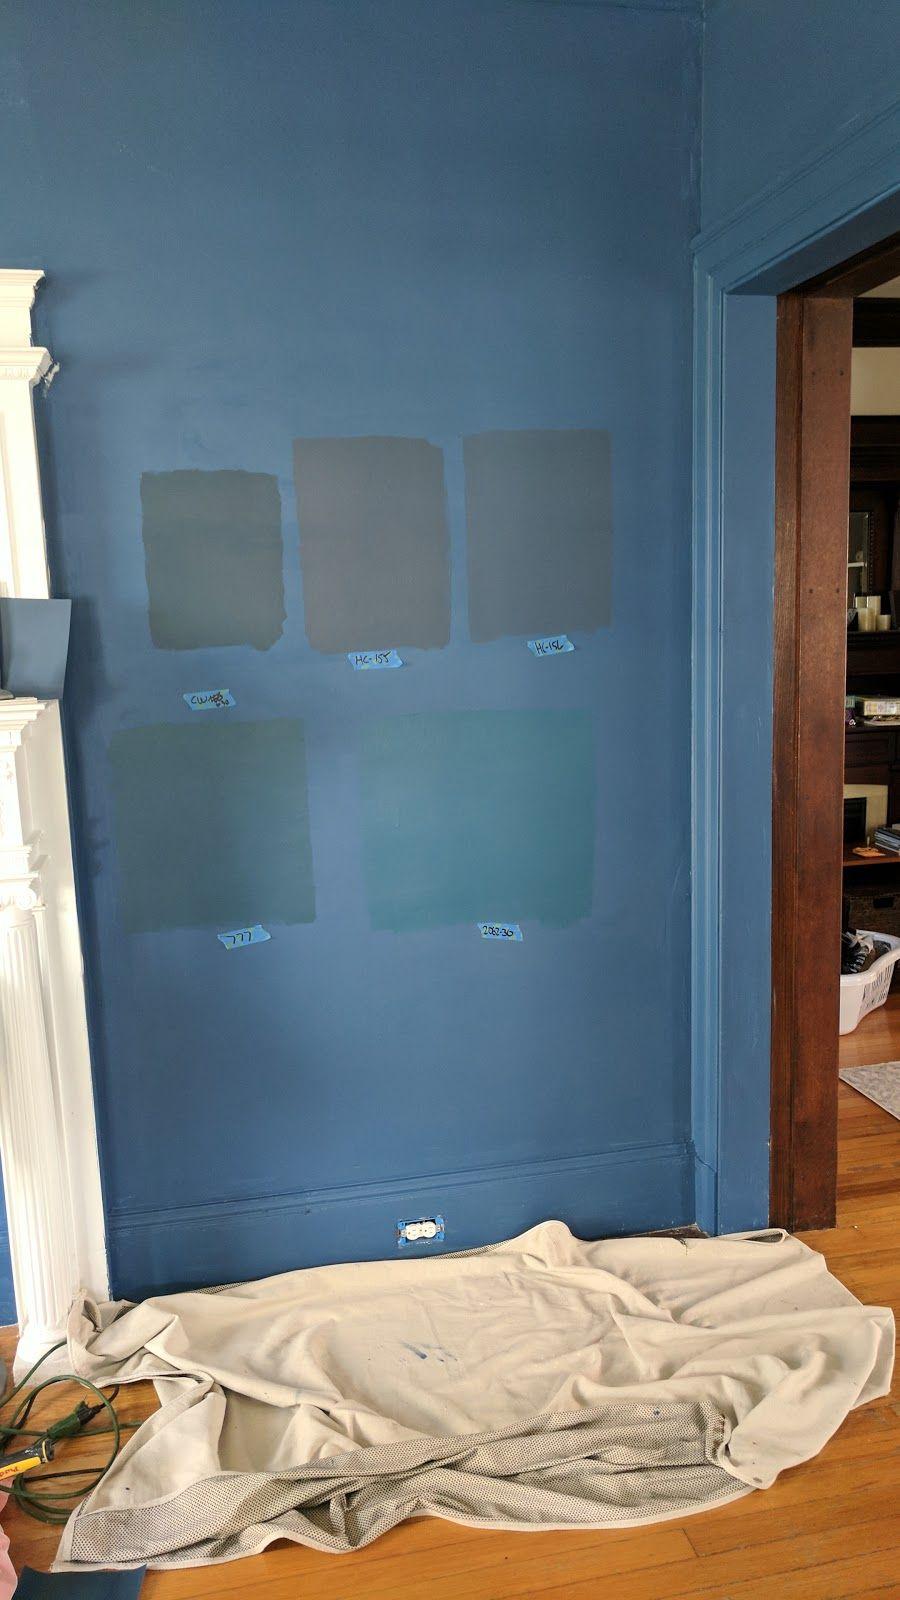 Benjamin Moore Blue Paint Samples Background New York State Of Mind Top Row Washington Newburyport Van Deusen Bottom Summer Nights